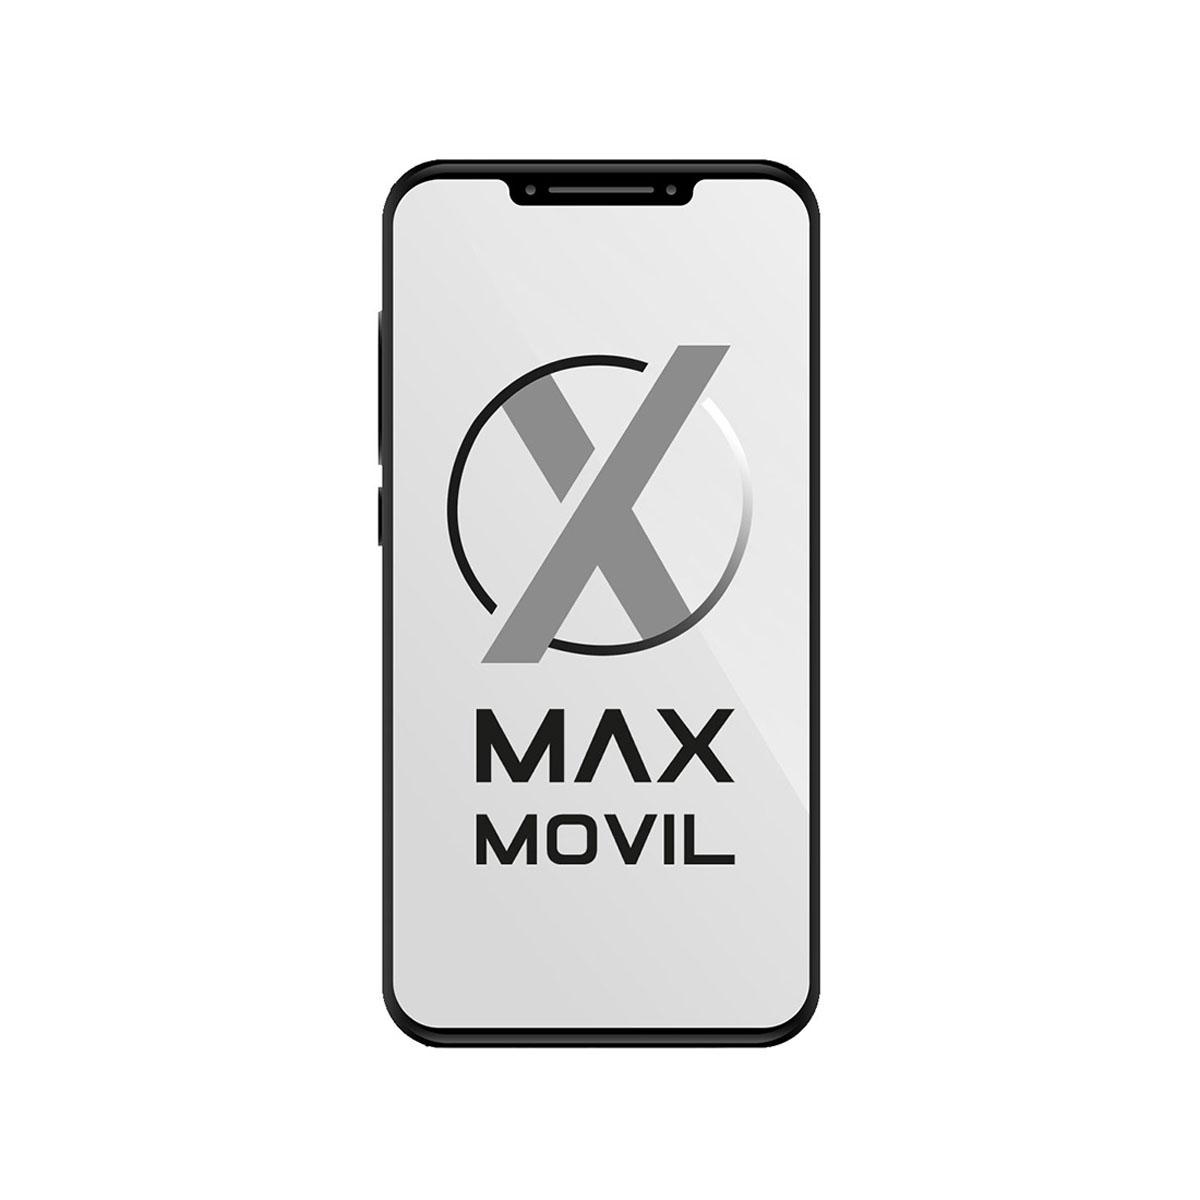 Apple Watch Series 5 Nike GPS, Caja 44mm Aluminio Plata y correa deportiva platino puro/negro MX3V2TY/A